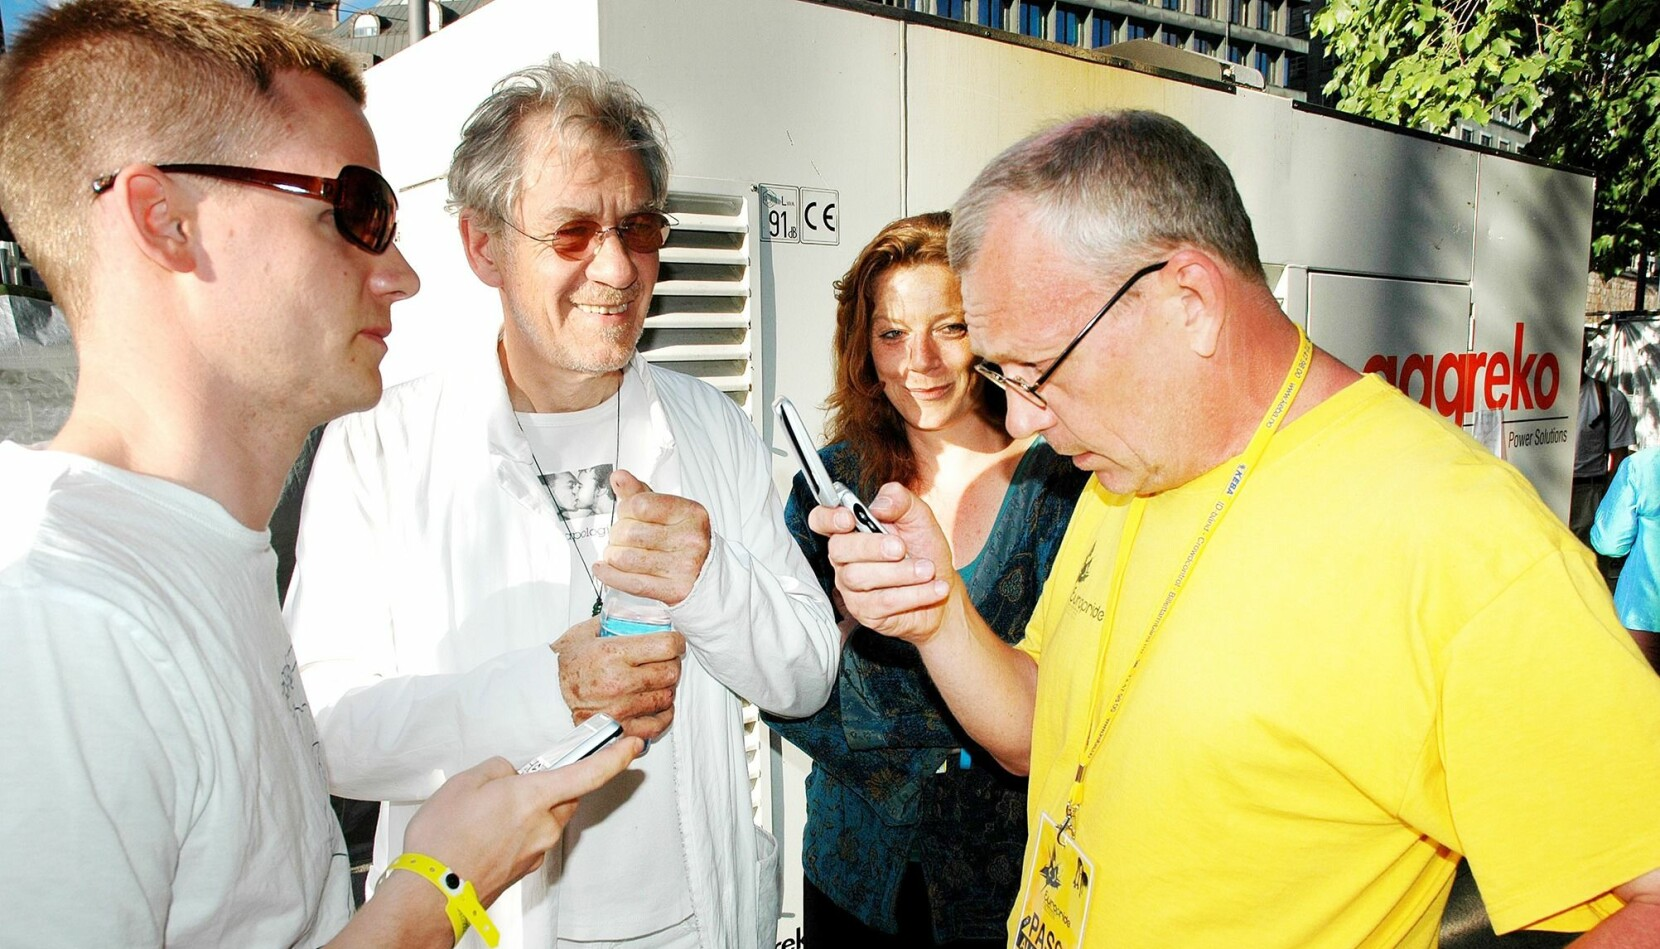 Arne Walderhaug, sjef for Europride i 2005, her i Pride Park samme år sammen med skuespiller og æresgjest Ian McKellen og Marna Eide, leder i lhbt-nettverket i Amnesty International Norge.